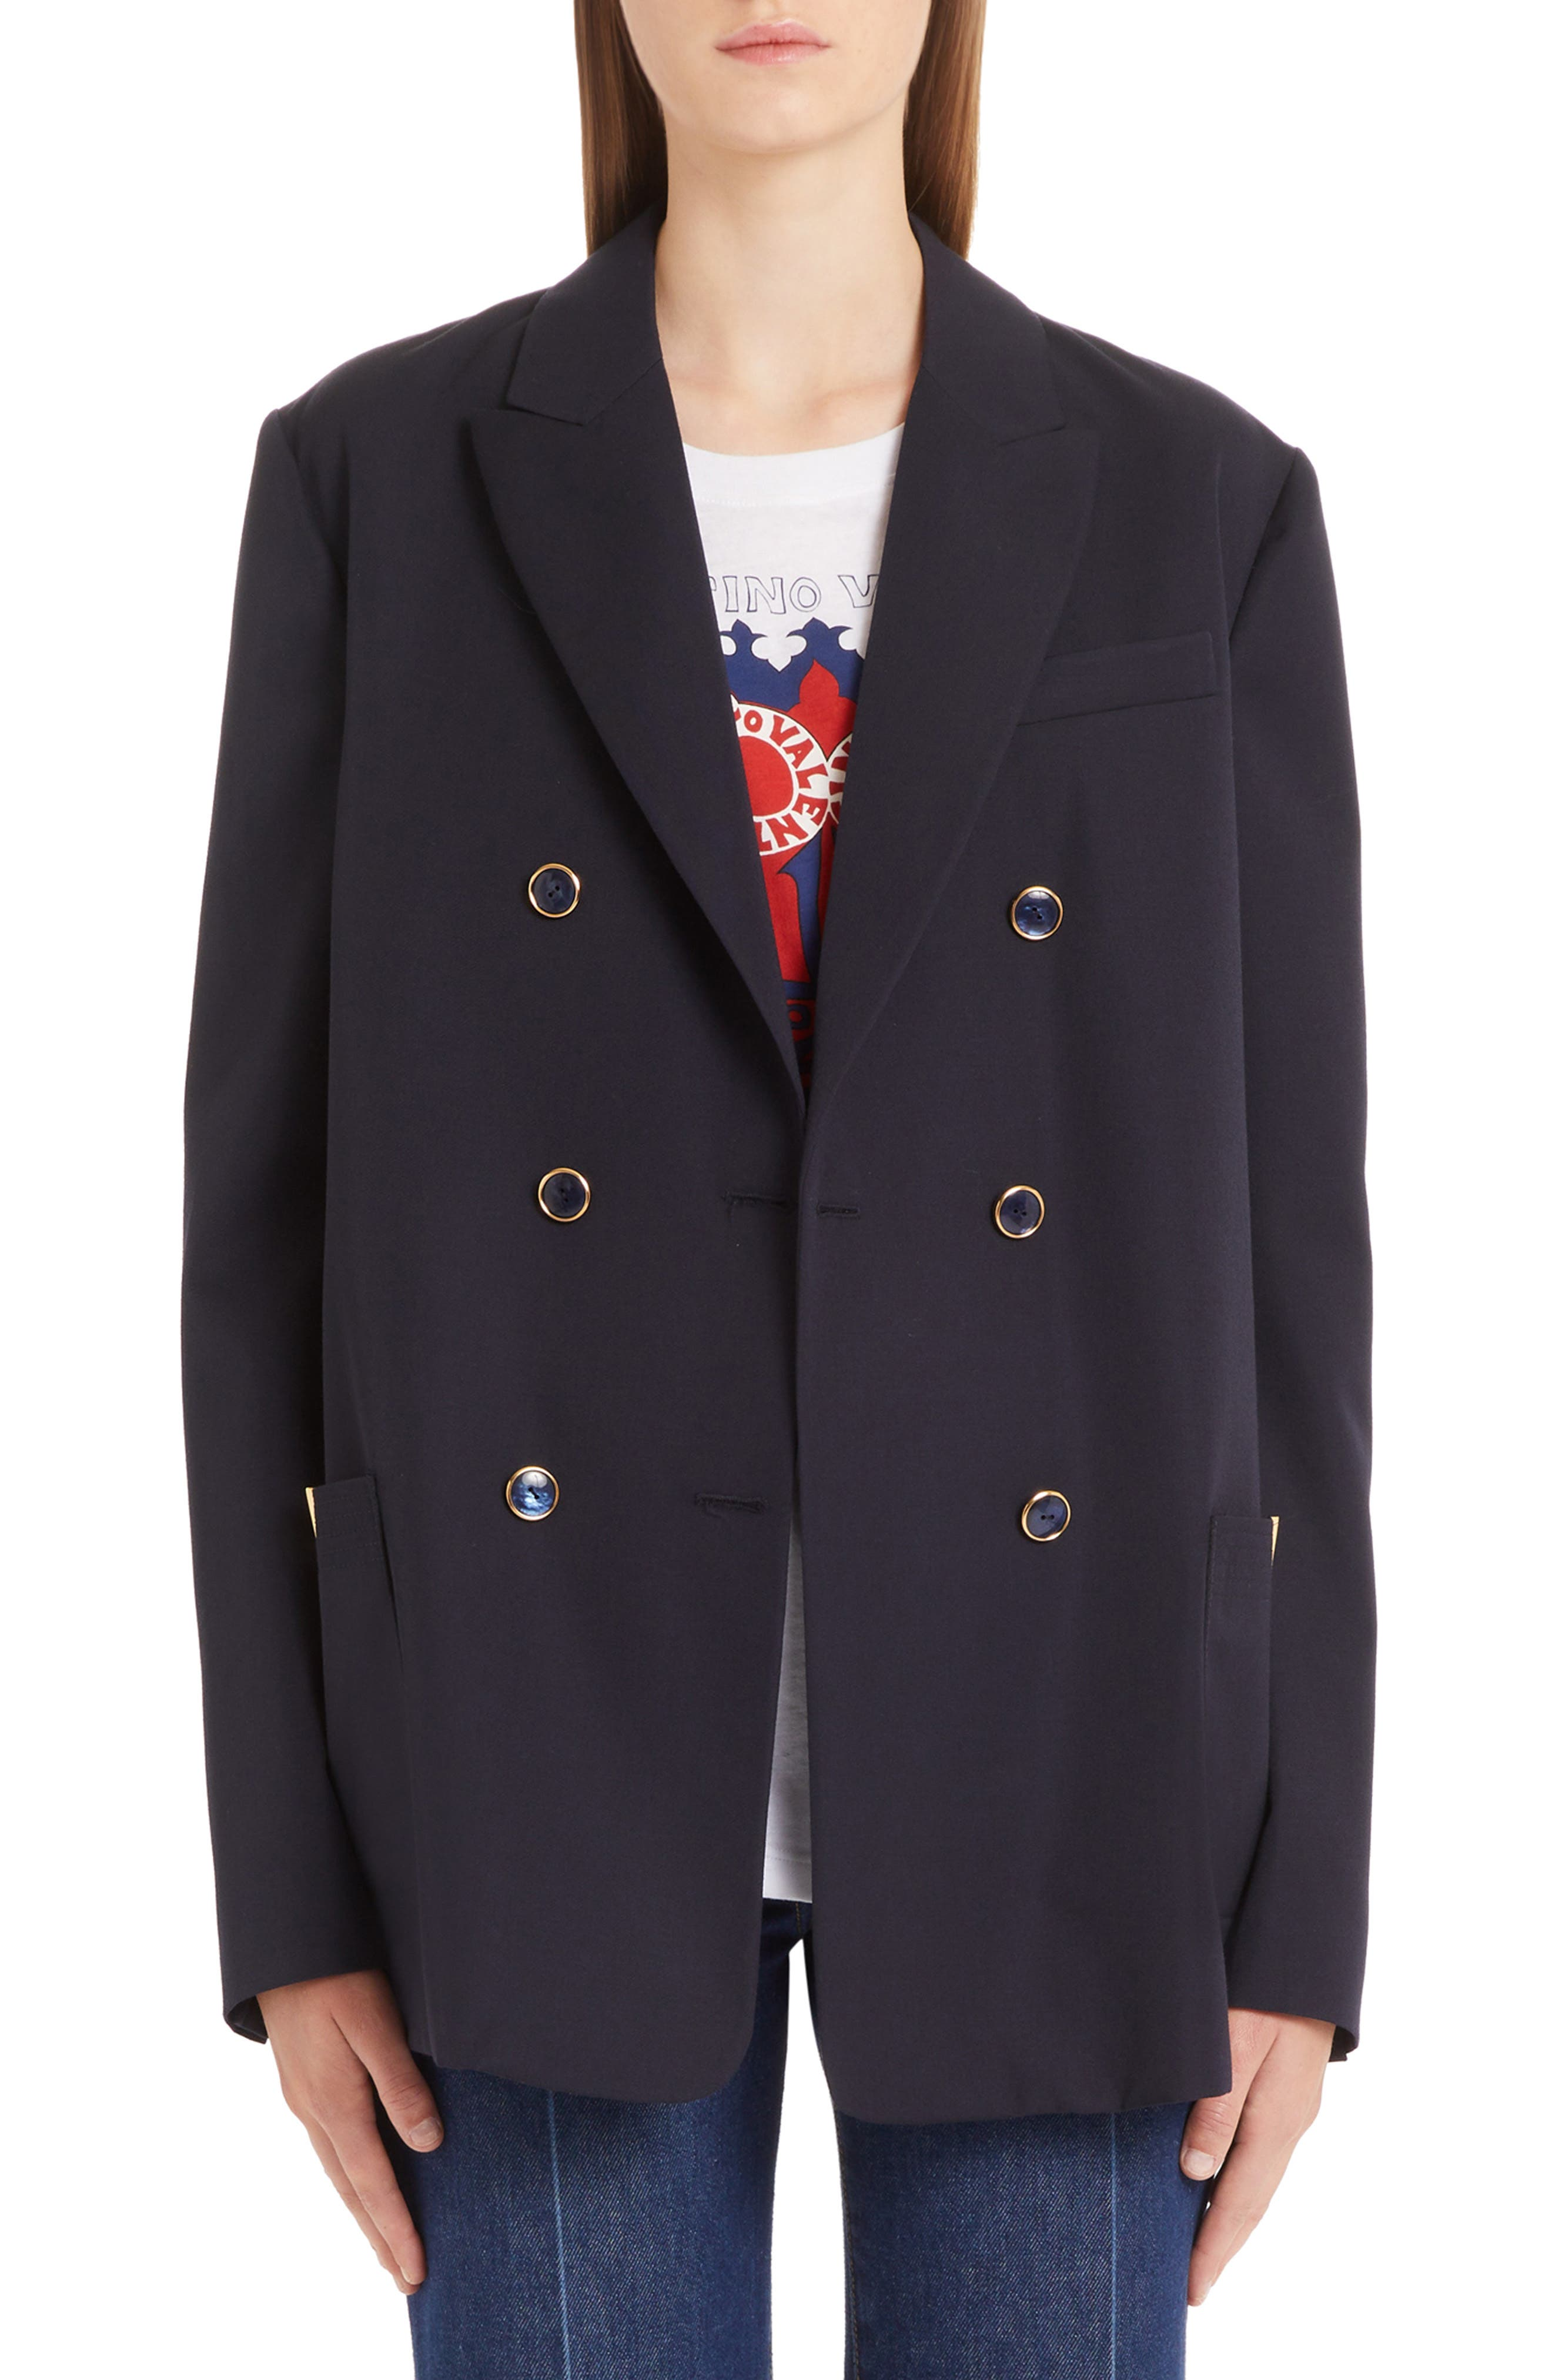 VALENTINO, V-Detail Wool Gabardine Jacket, Main thumbnail 1, color, NAVY